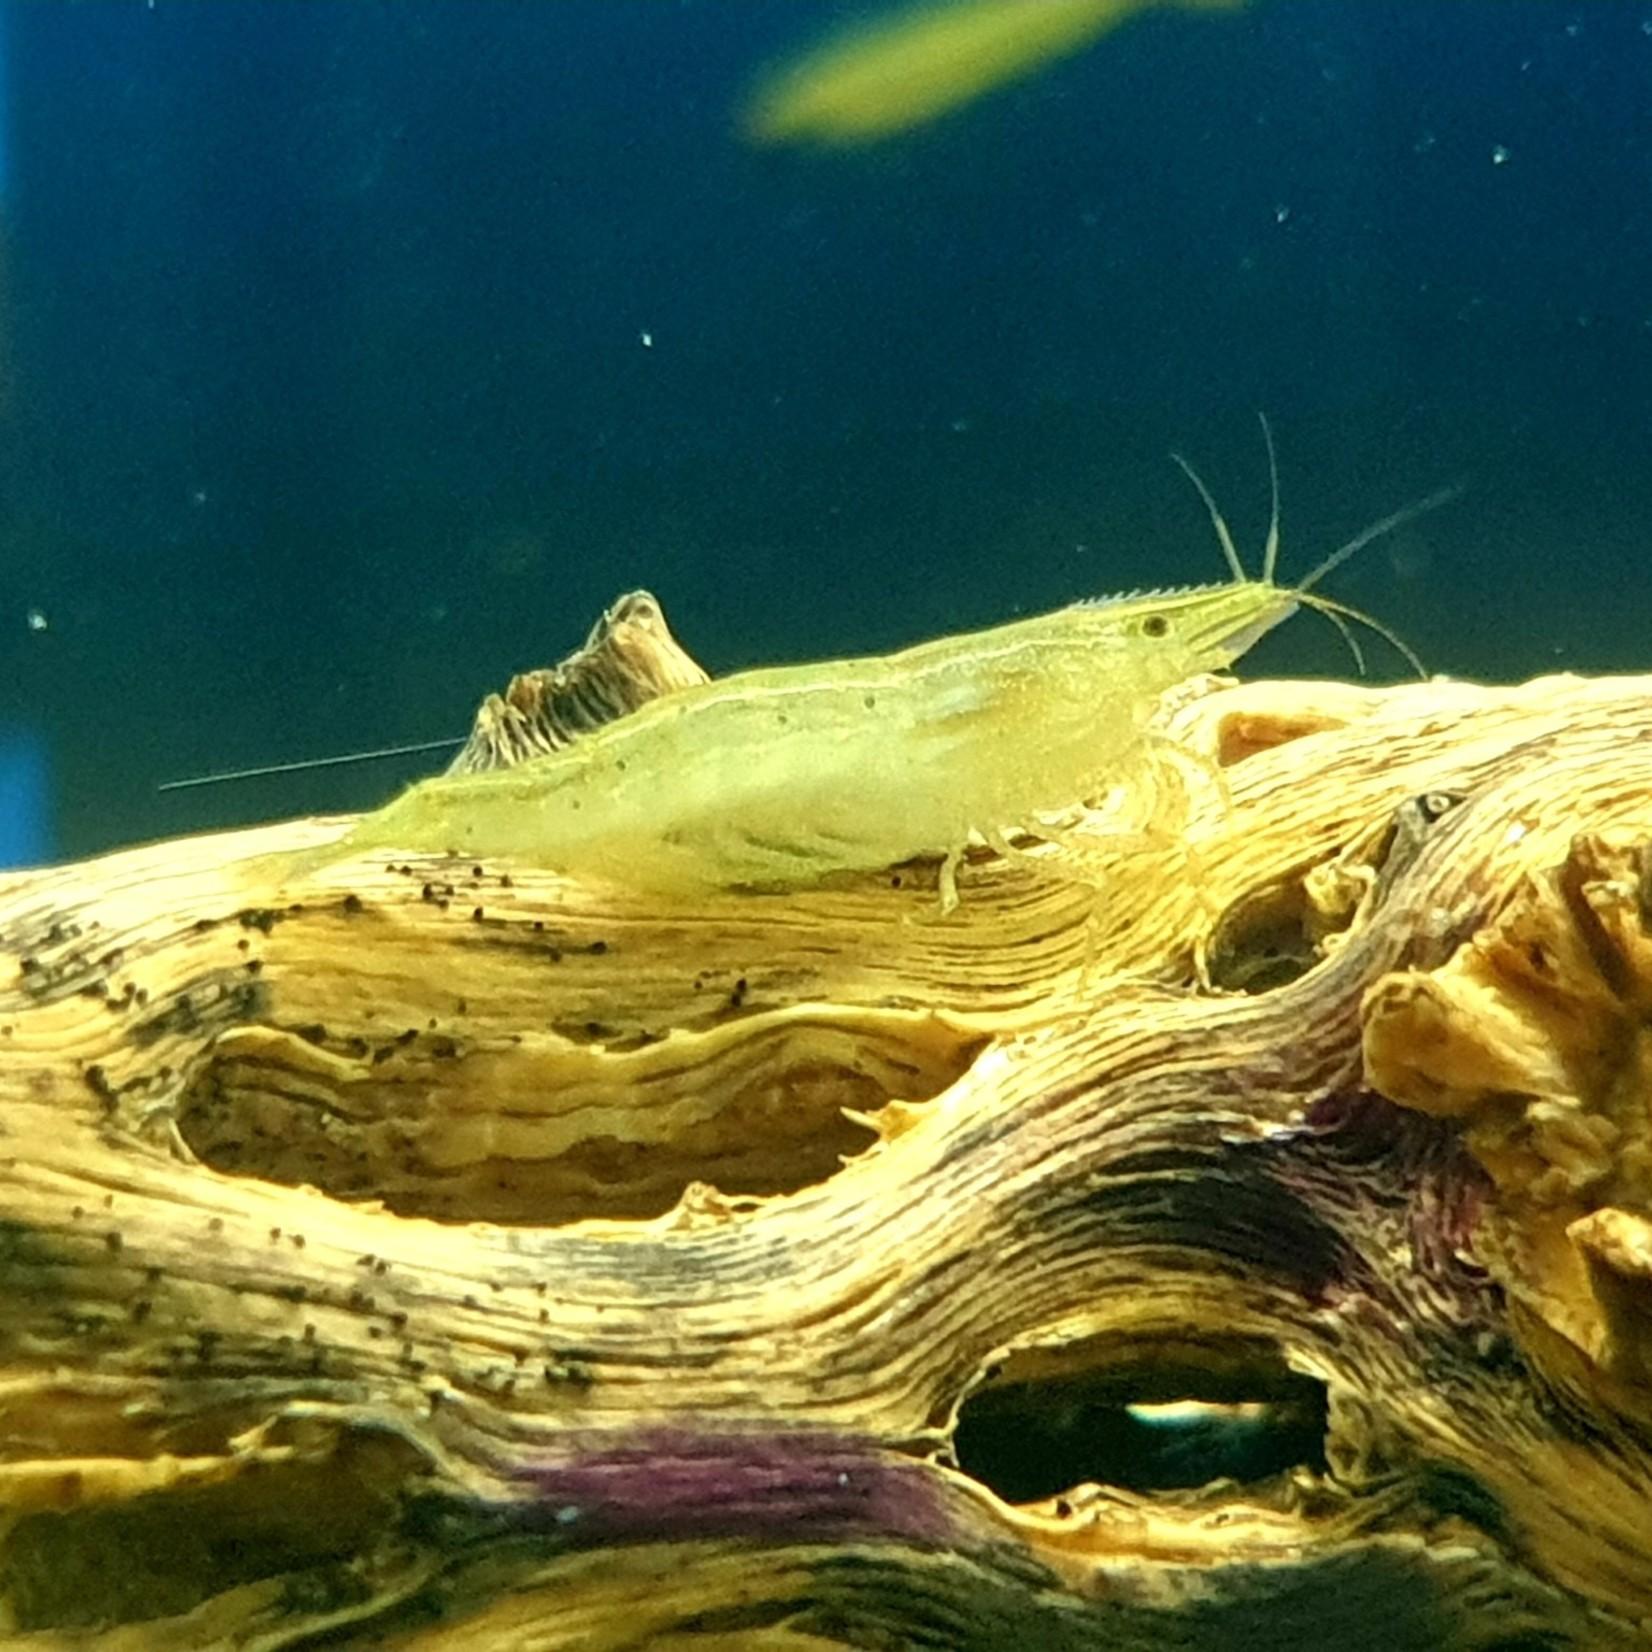 Bubba's Shrimps Caridina babaulti var. Groen